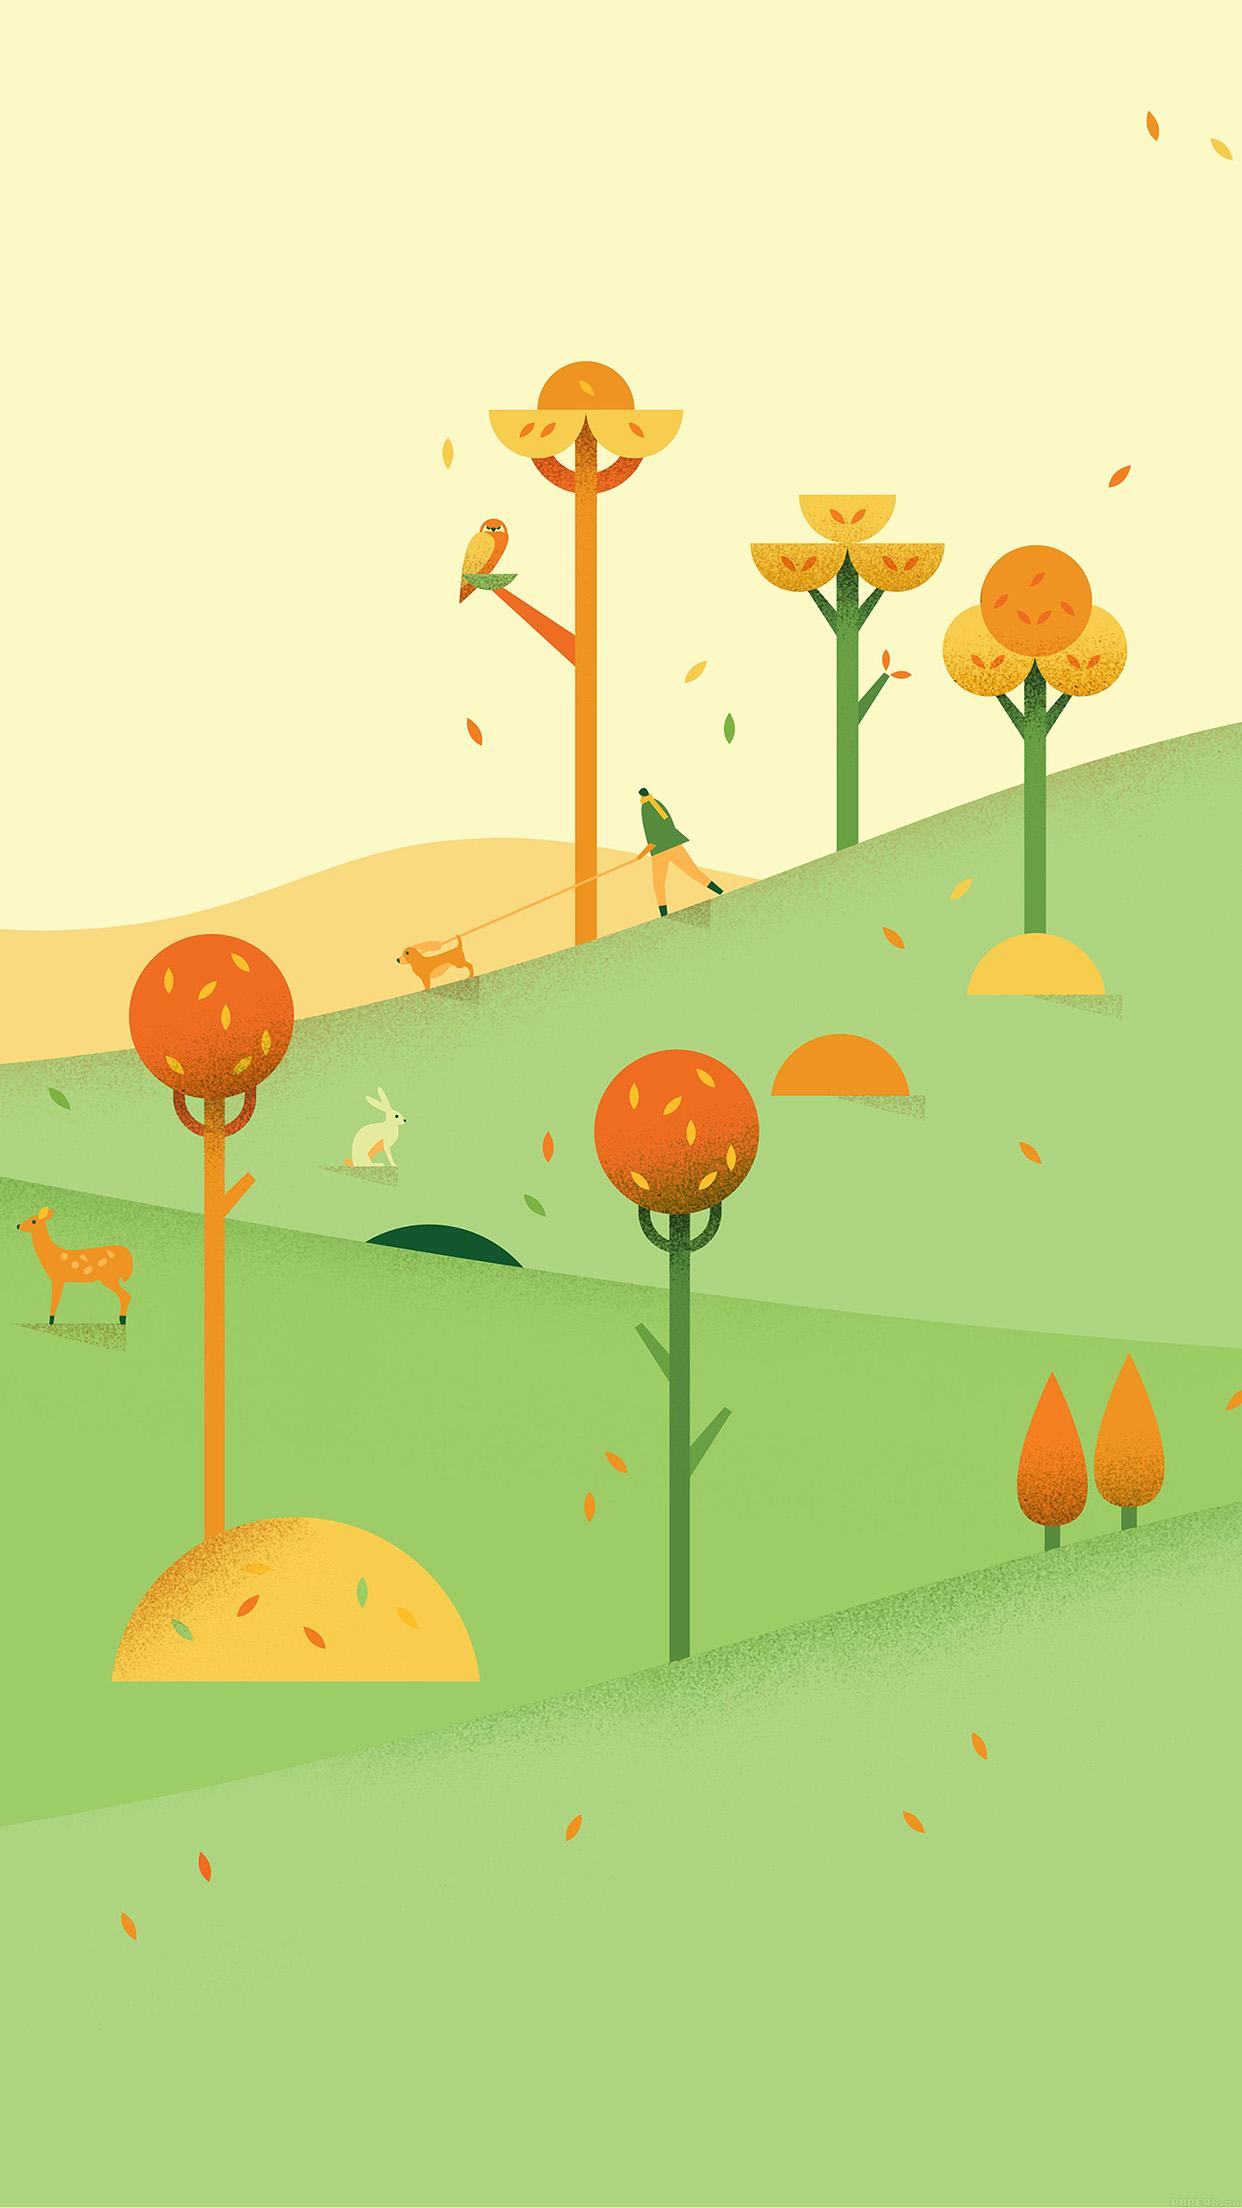 Must see Wallpaper Mountain Google - Google-Lollipop-September-Mountain-Animals  Pic_113318.jpg